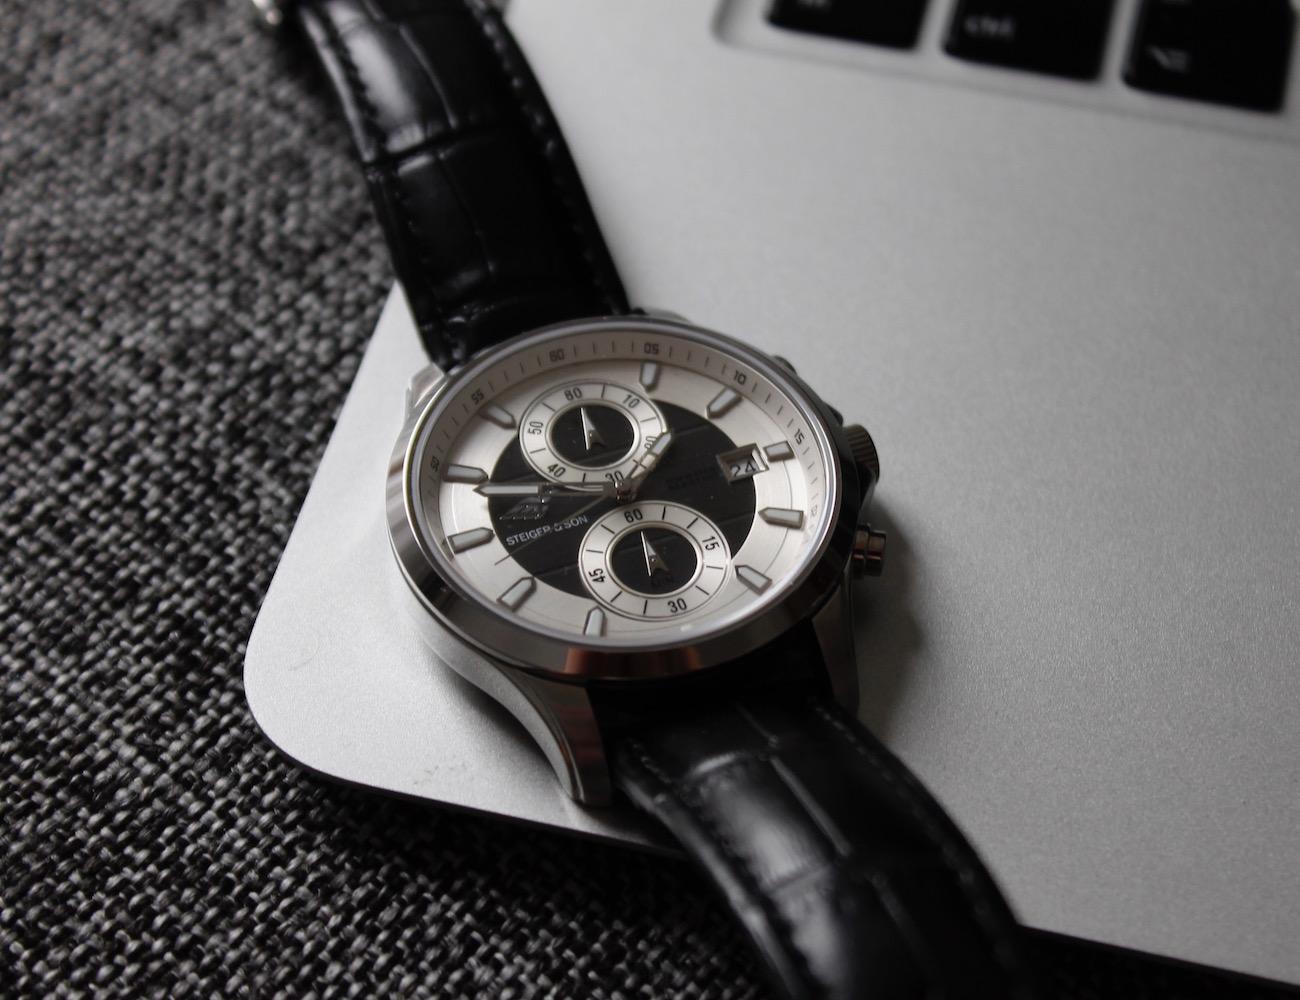 Revoution 1 Chronograph